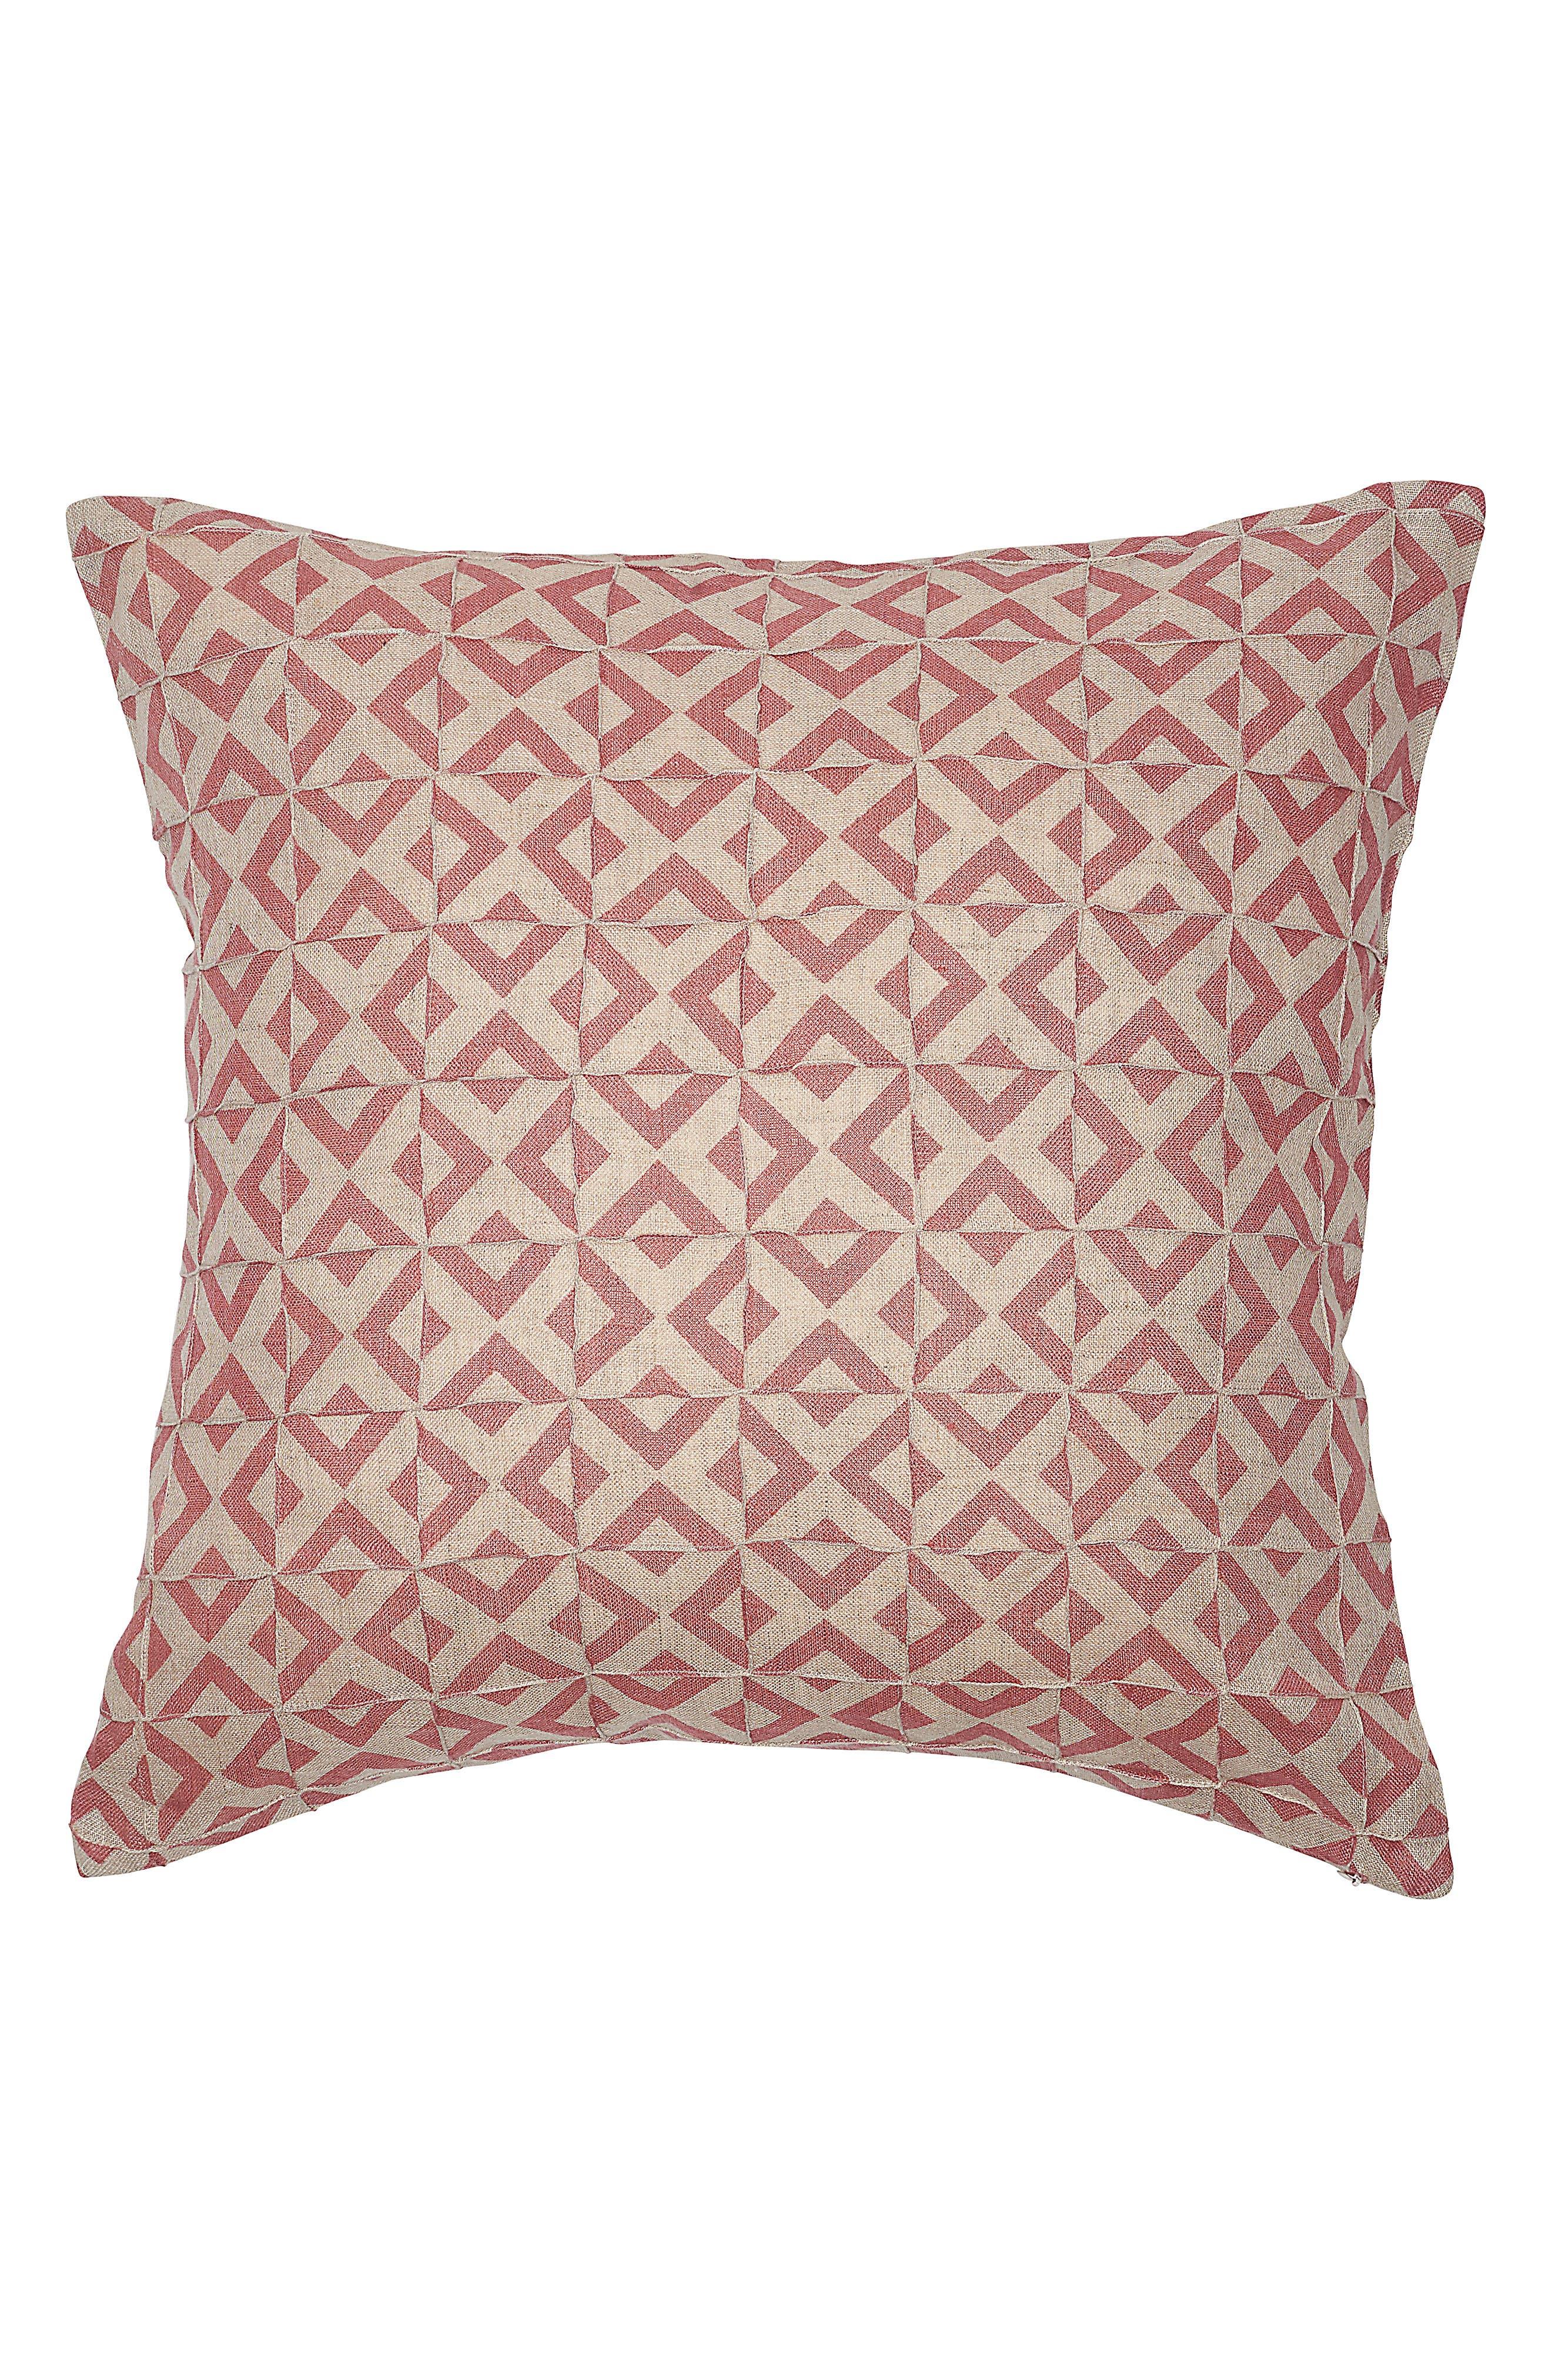 EADIE LIFESTYLE Surrey Pintuck Linen Accent Pillow, Main, color, DUSTY ROSE MULTI